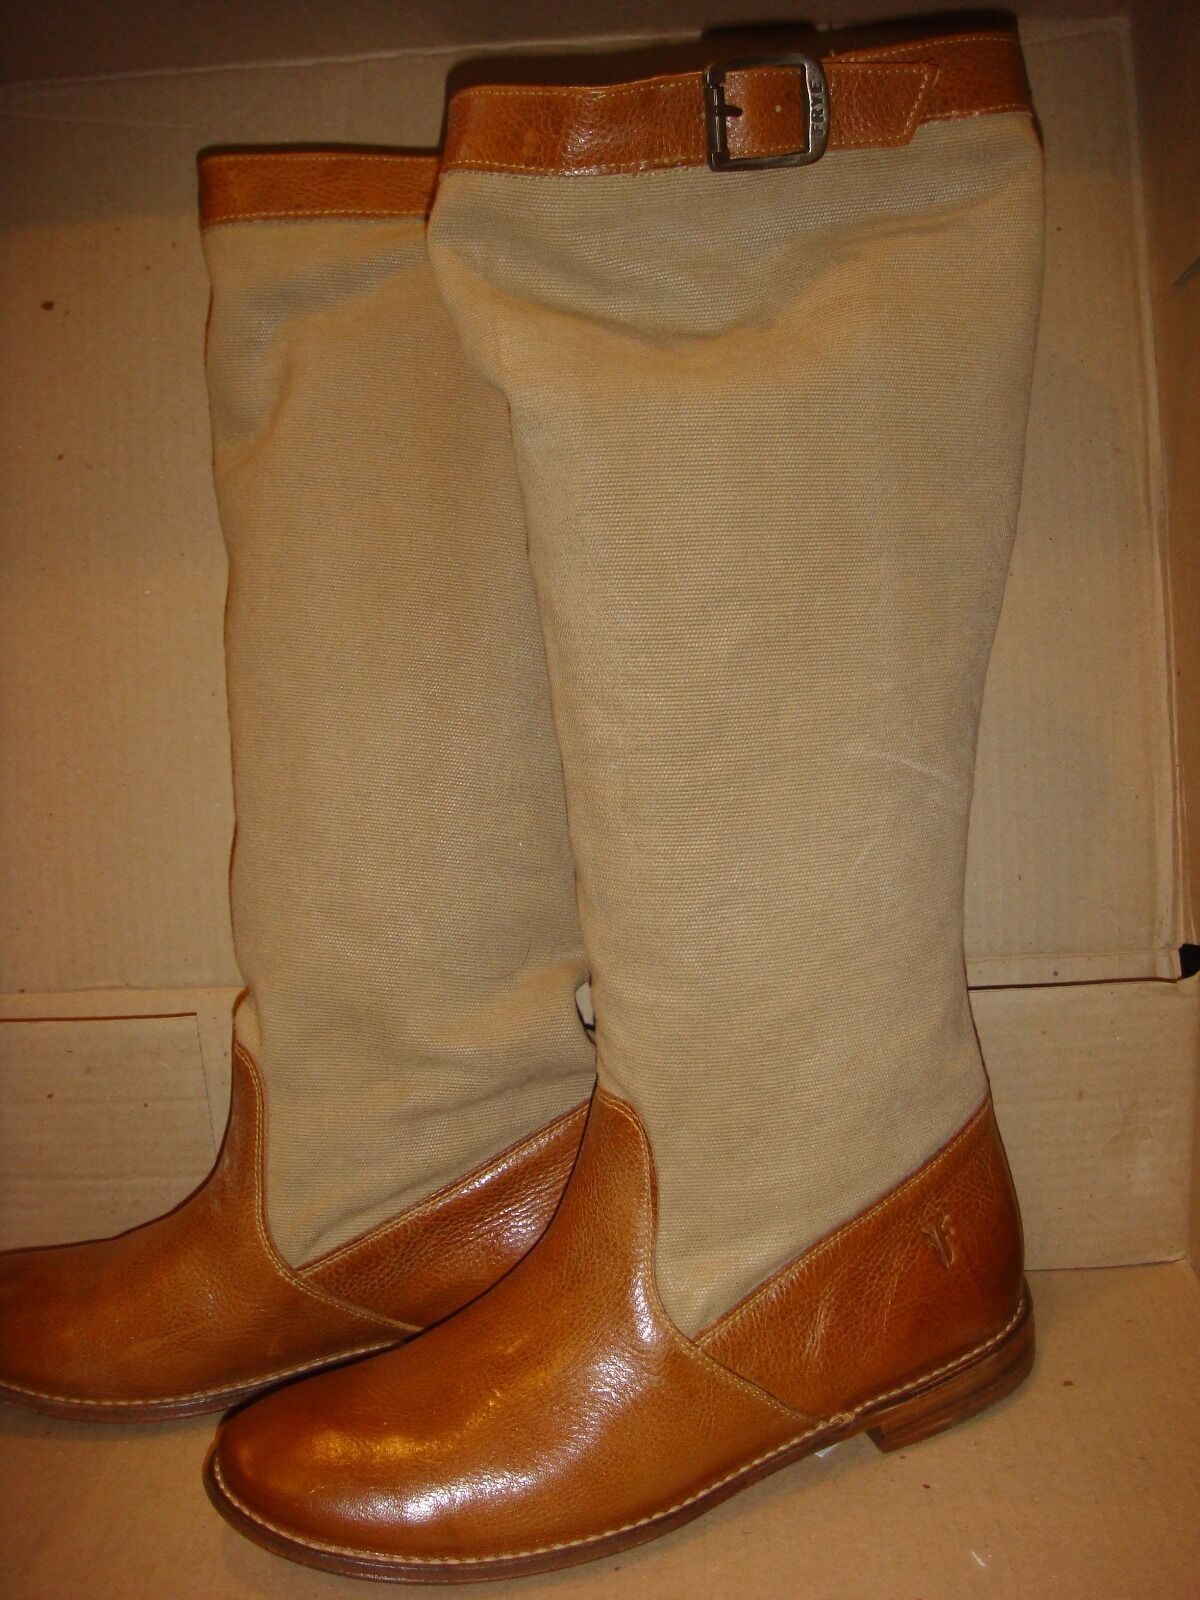 $480 Victoria's Secret schuhe Boot FRYE  Leder BROWN Canvas size 9 Knee High NEW*